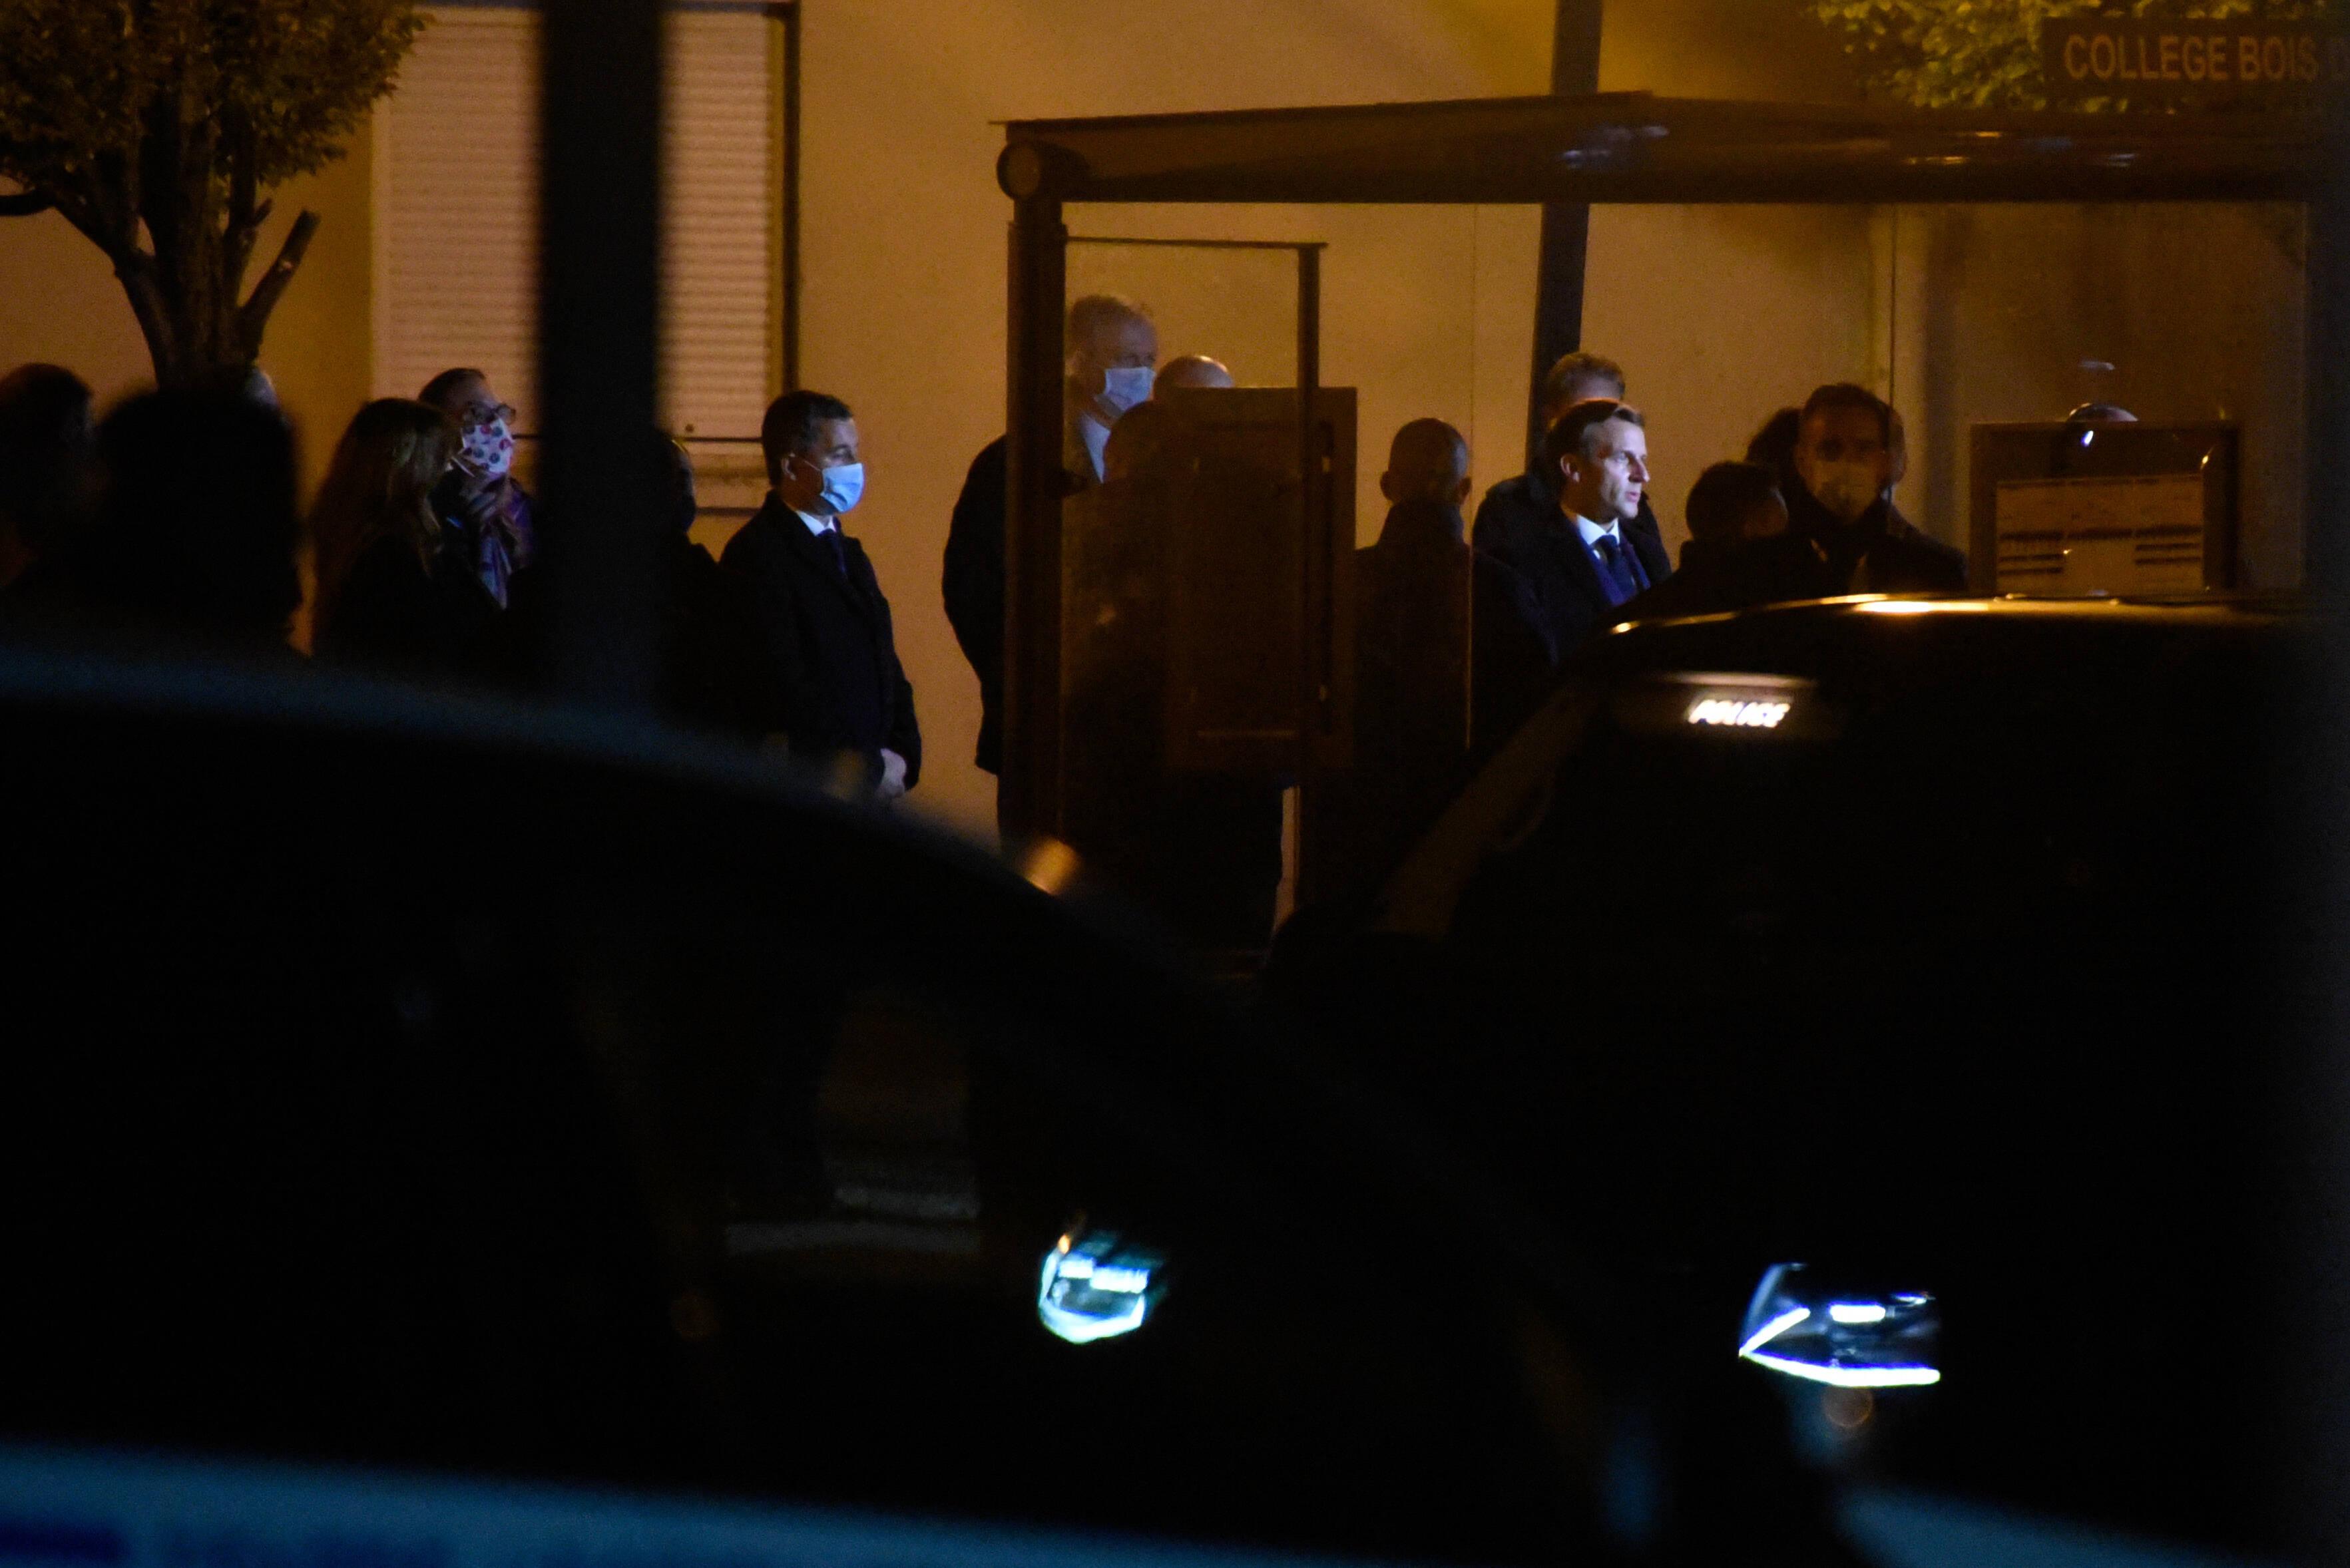 На место преступления прибыл президент Франции Макрон